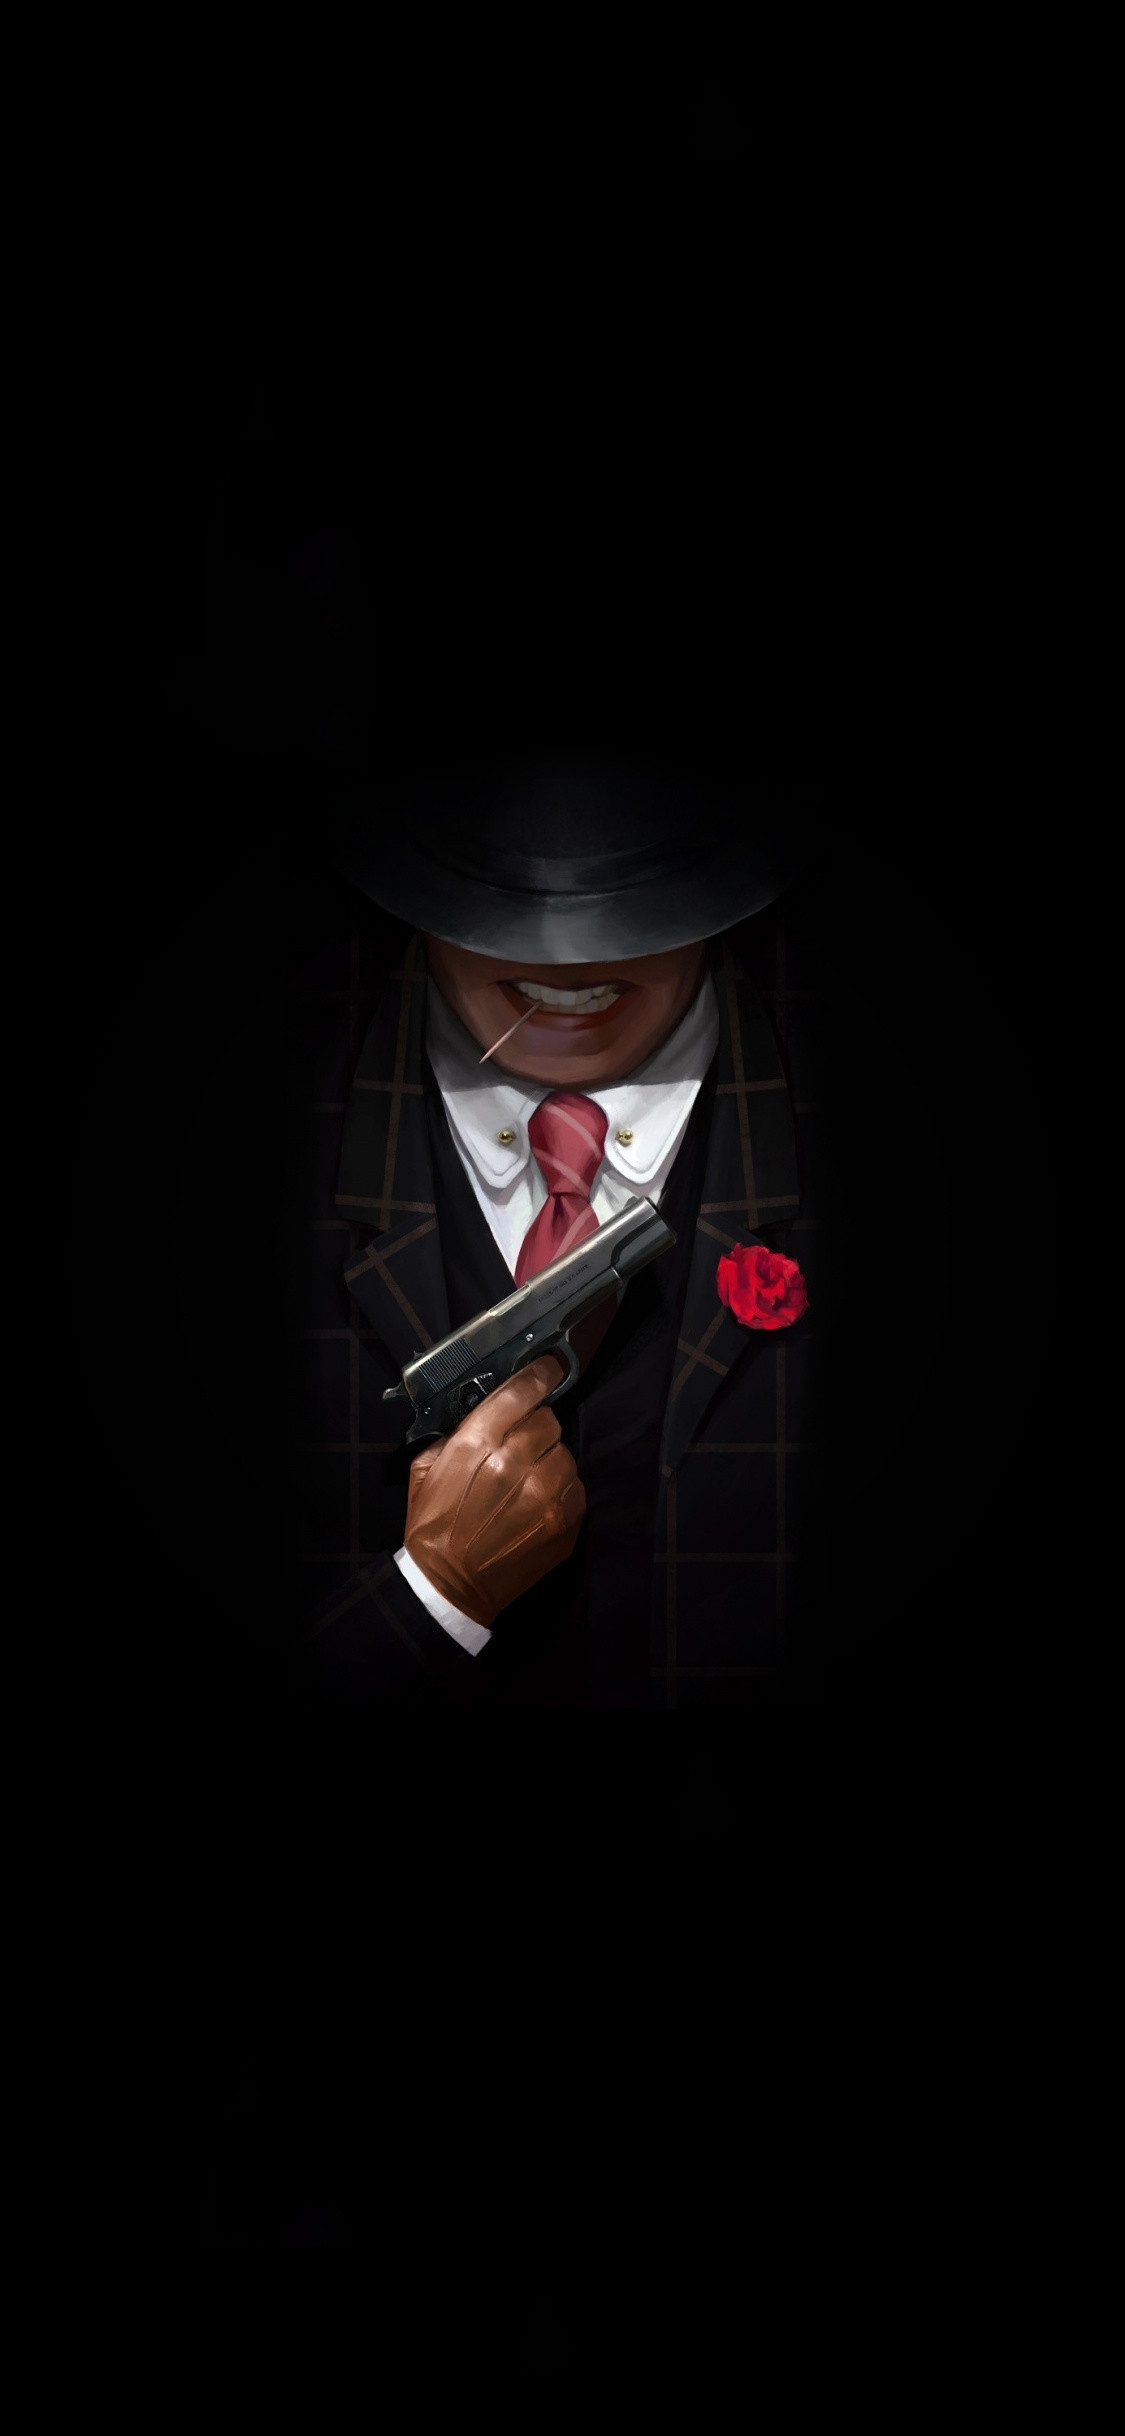 1125x2436 Download Wallpaper Gangster With Gun Minimal Gun Wallpaper Iphone X 1125x2436 Wallpaper Teahub Io